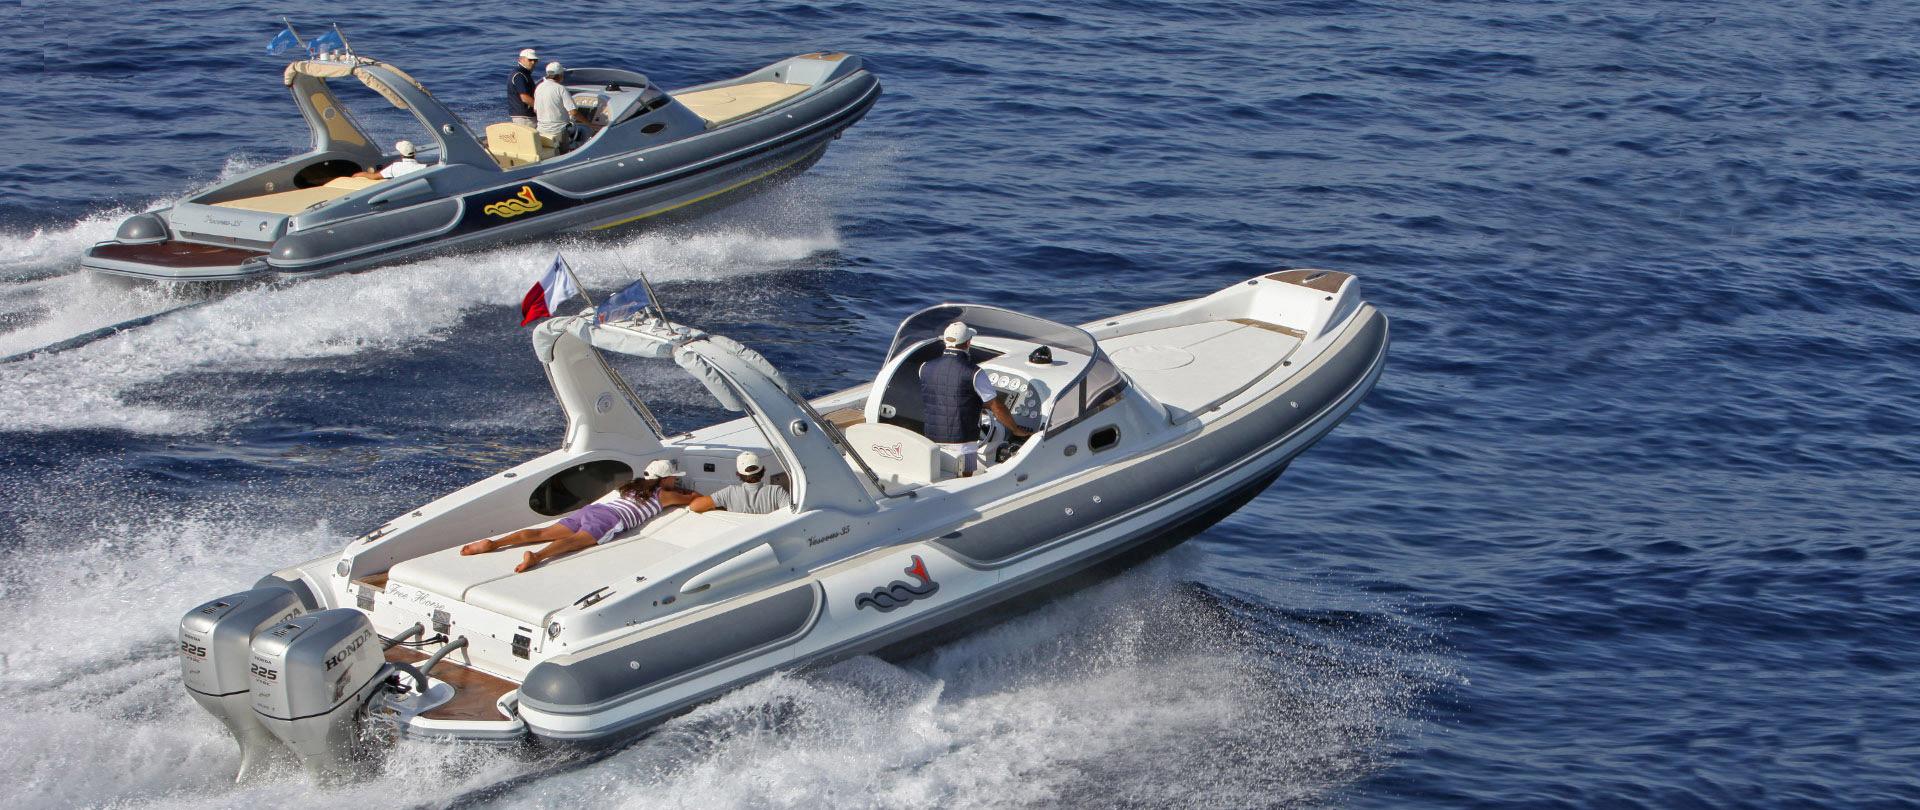 Autobahn Ltd. - An Official Representative of MV Marine in Maltese Islands